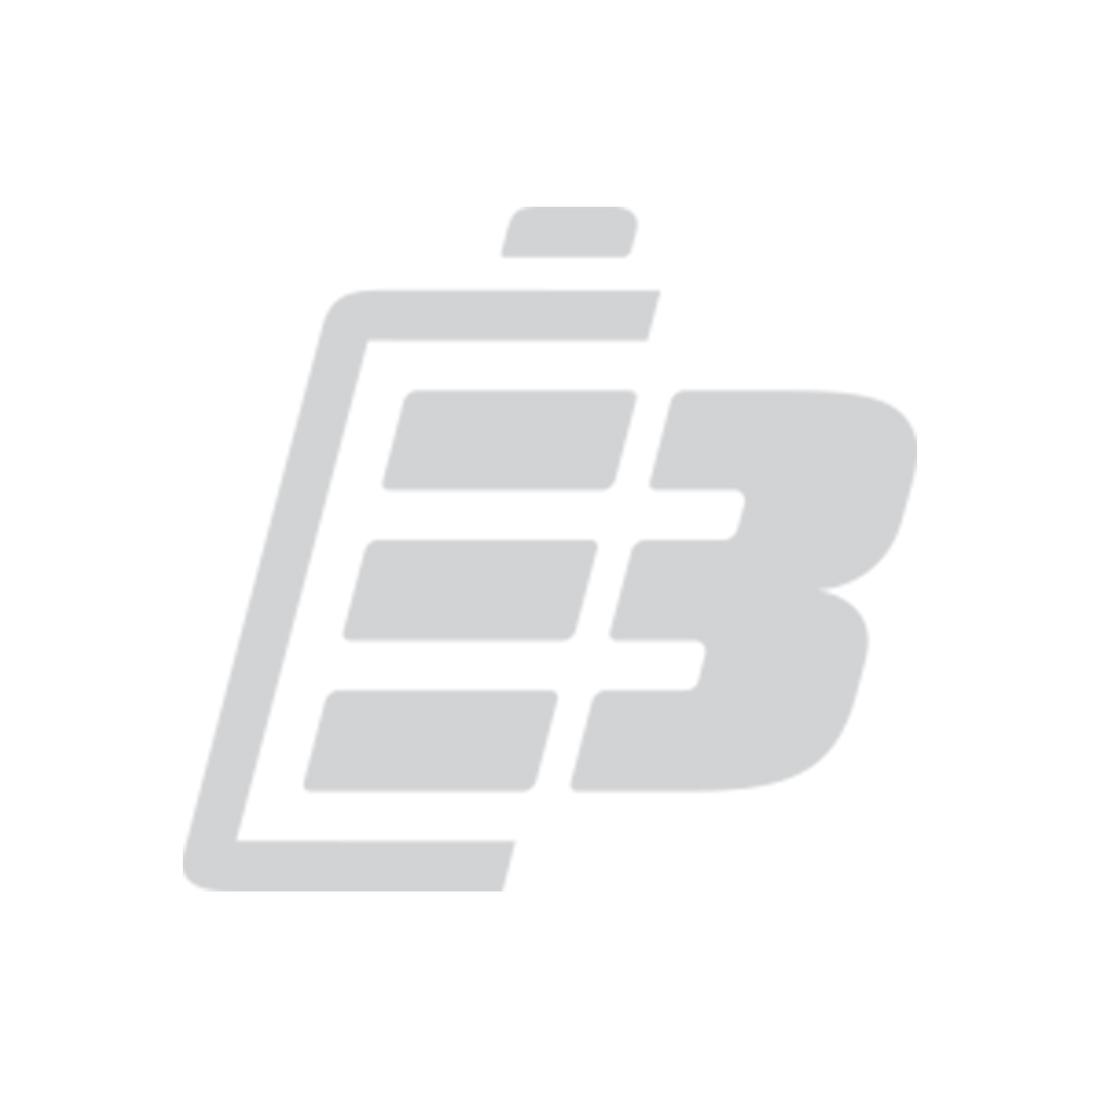 Wireless router battery Huawei E5573_1